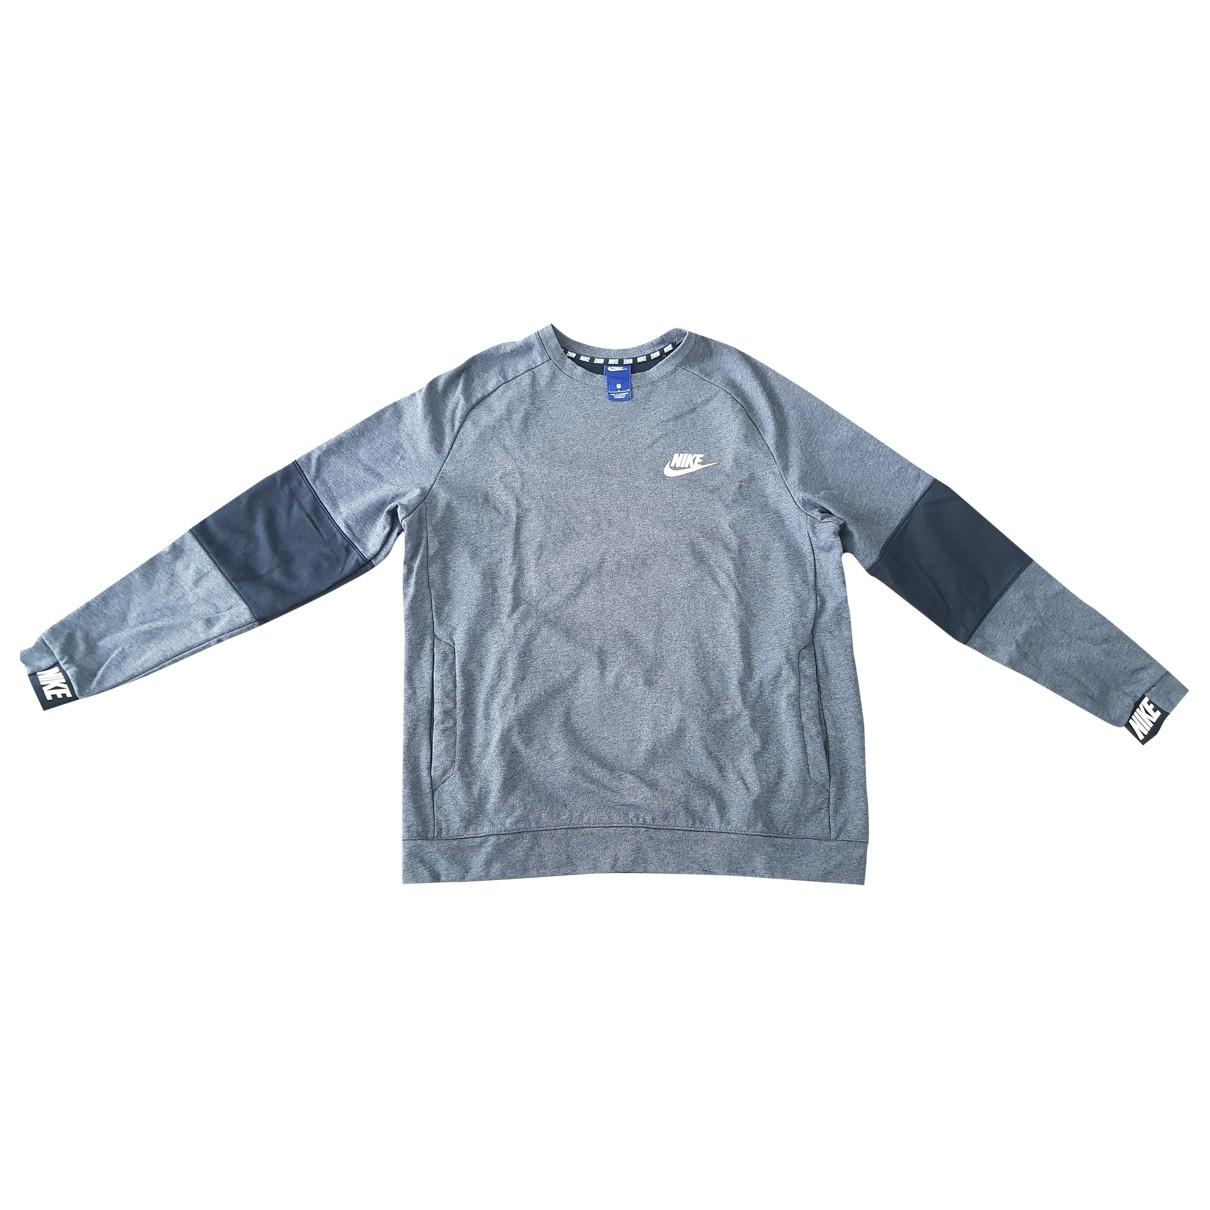 Nike \N Grey Cotton Knitwear & Sweatshirts for Men XL International